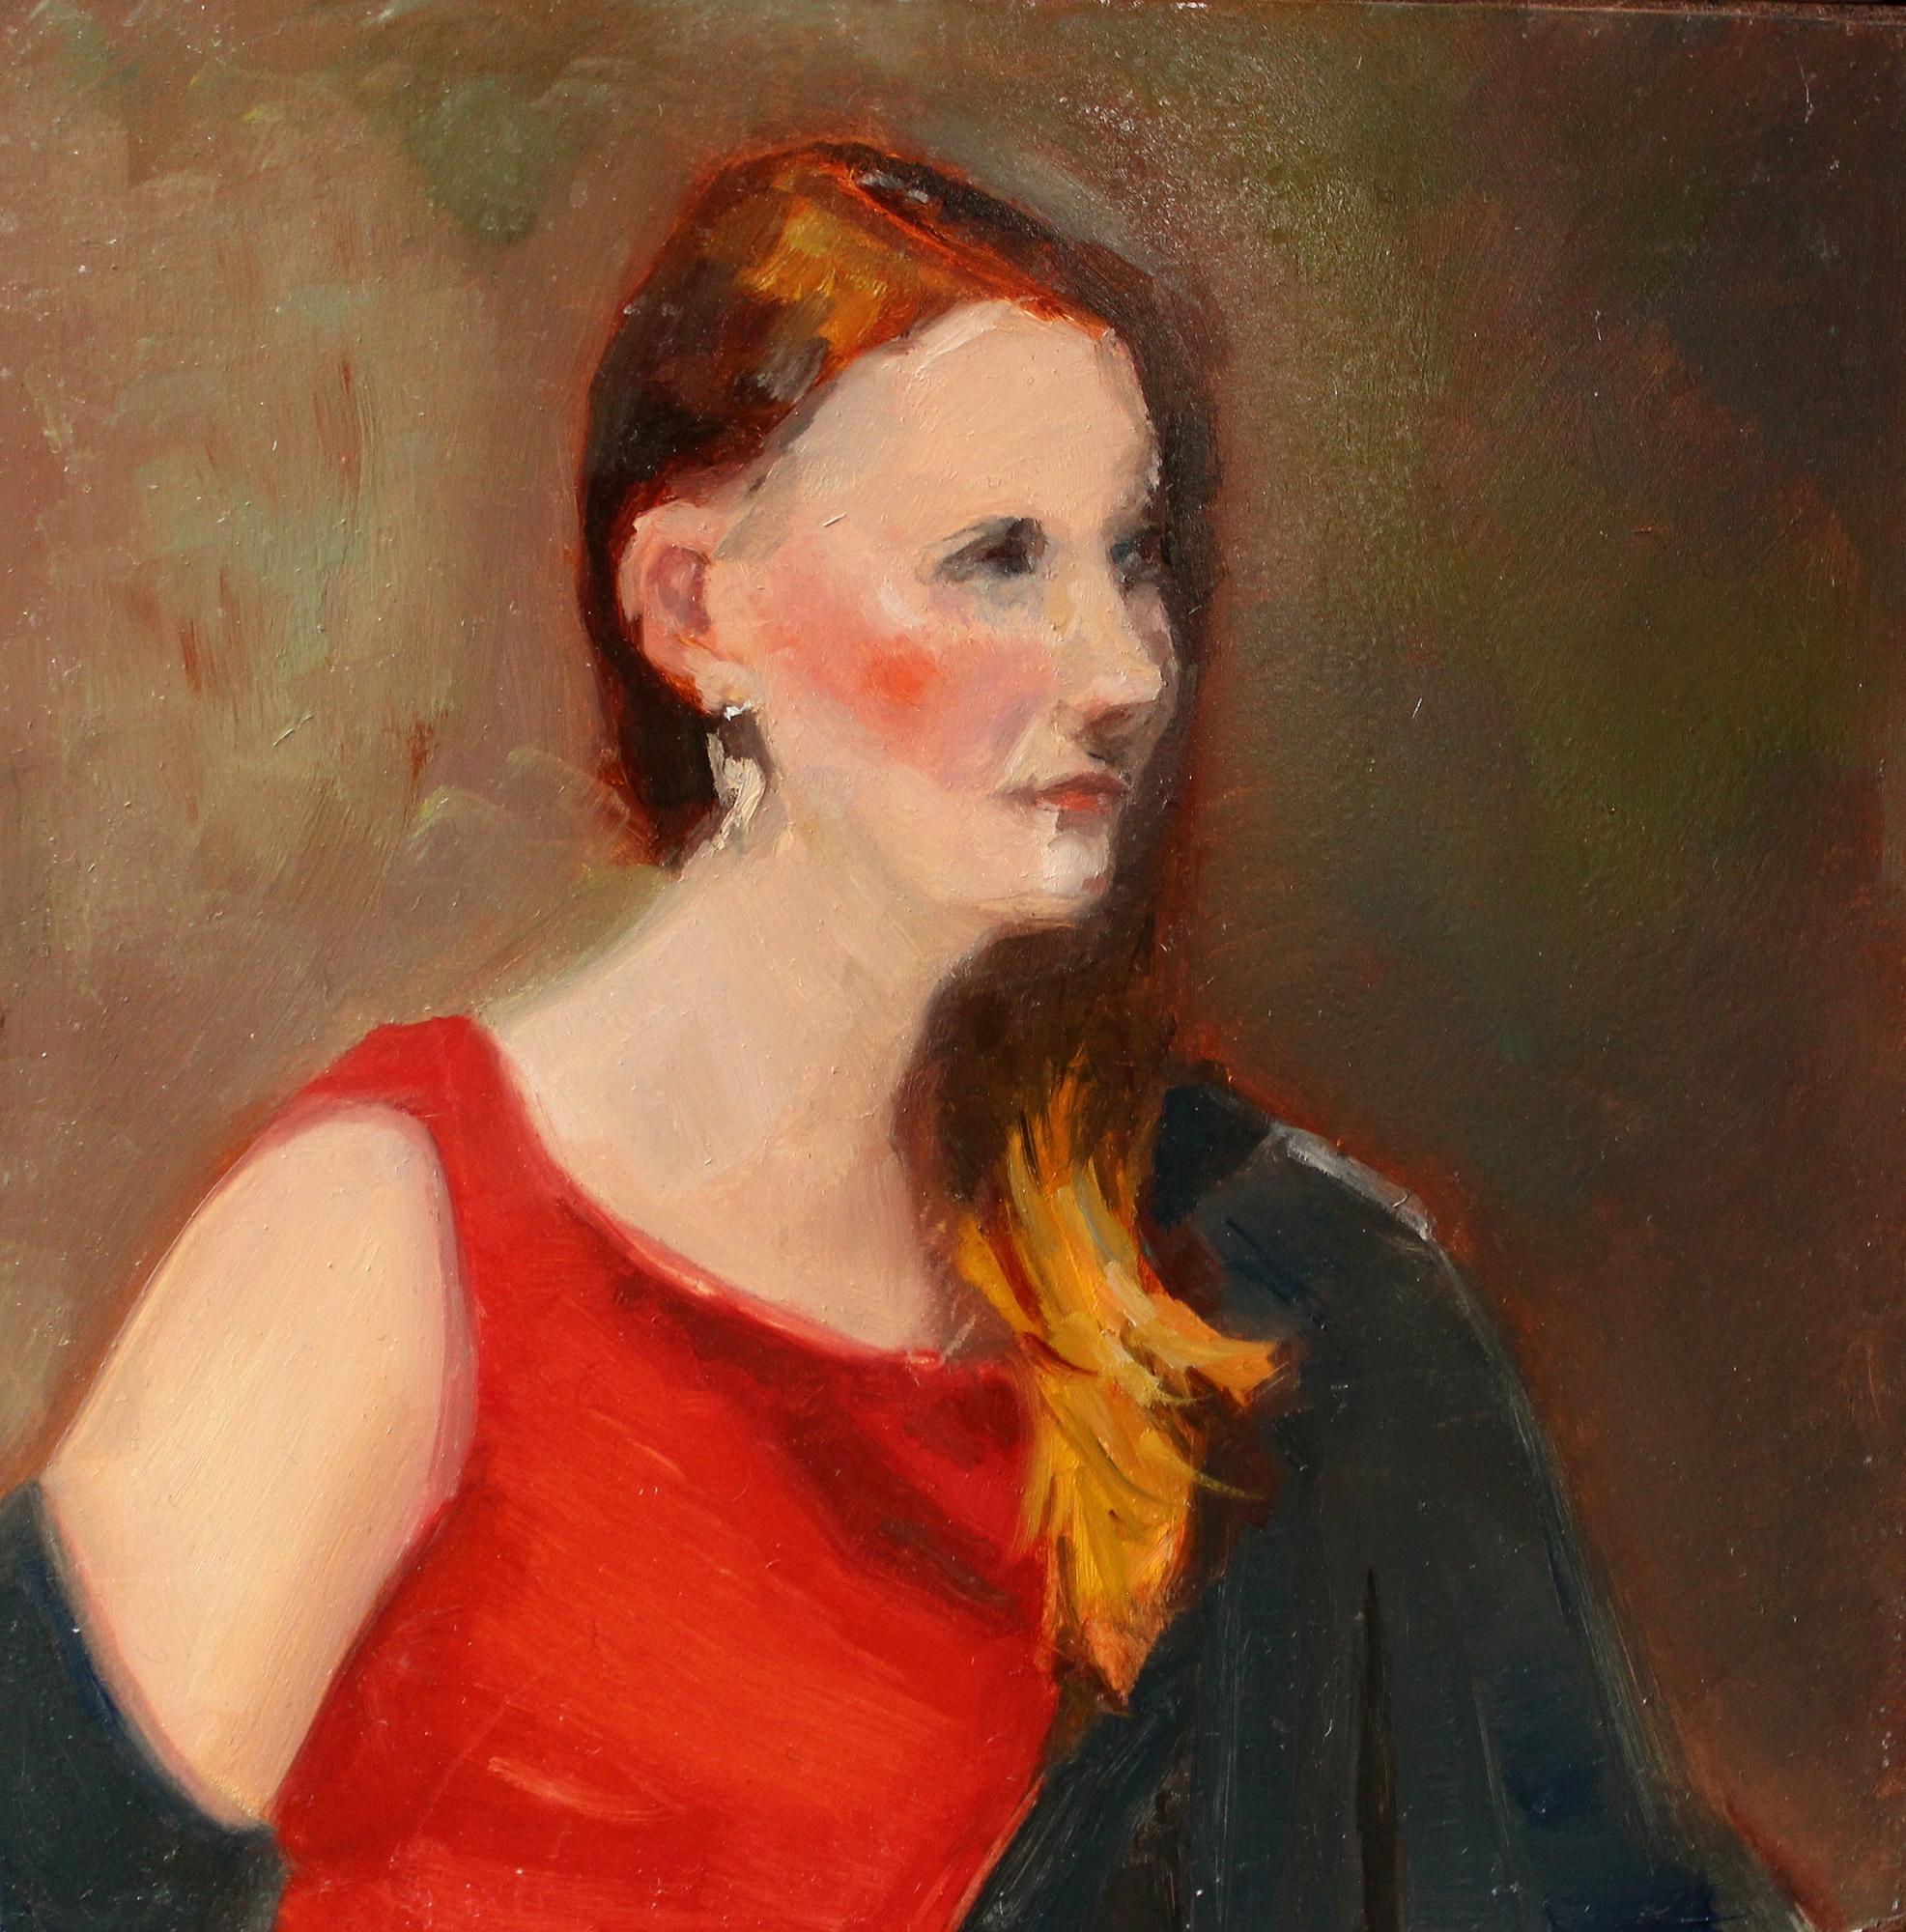 Red Dress, Green Shawl  by Win  Kuplowsky